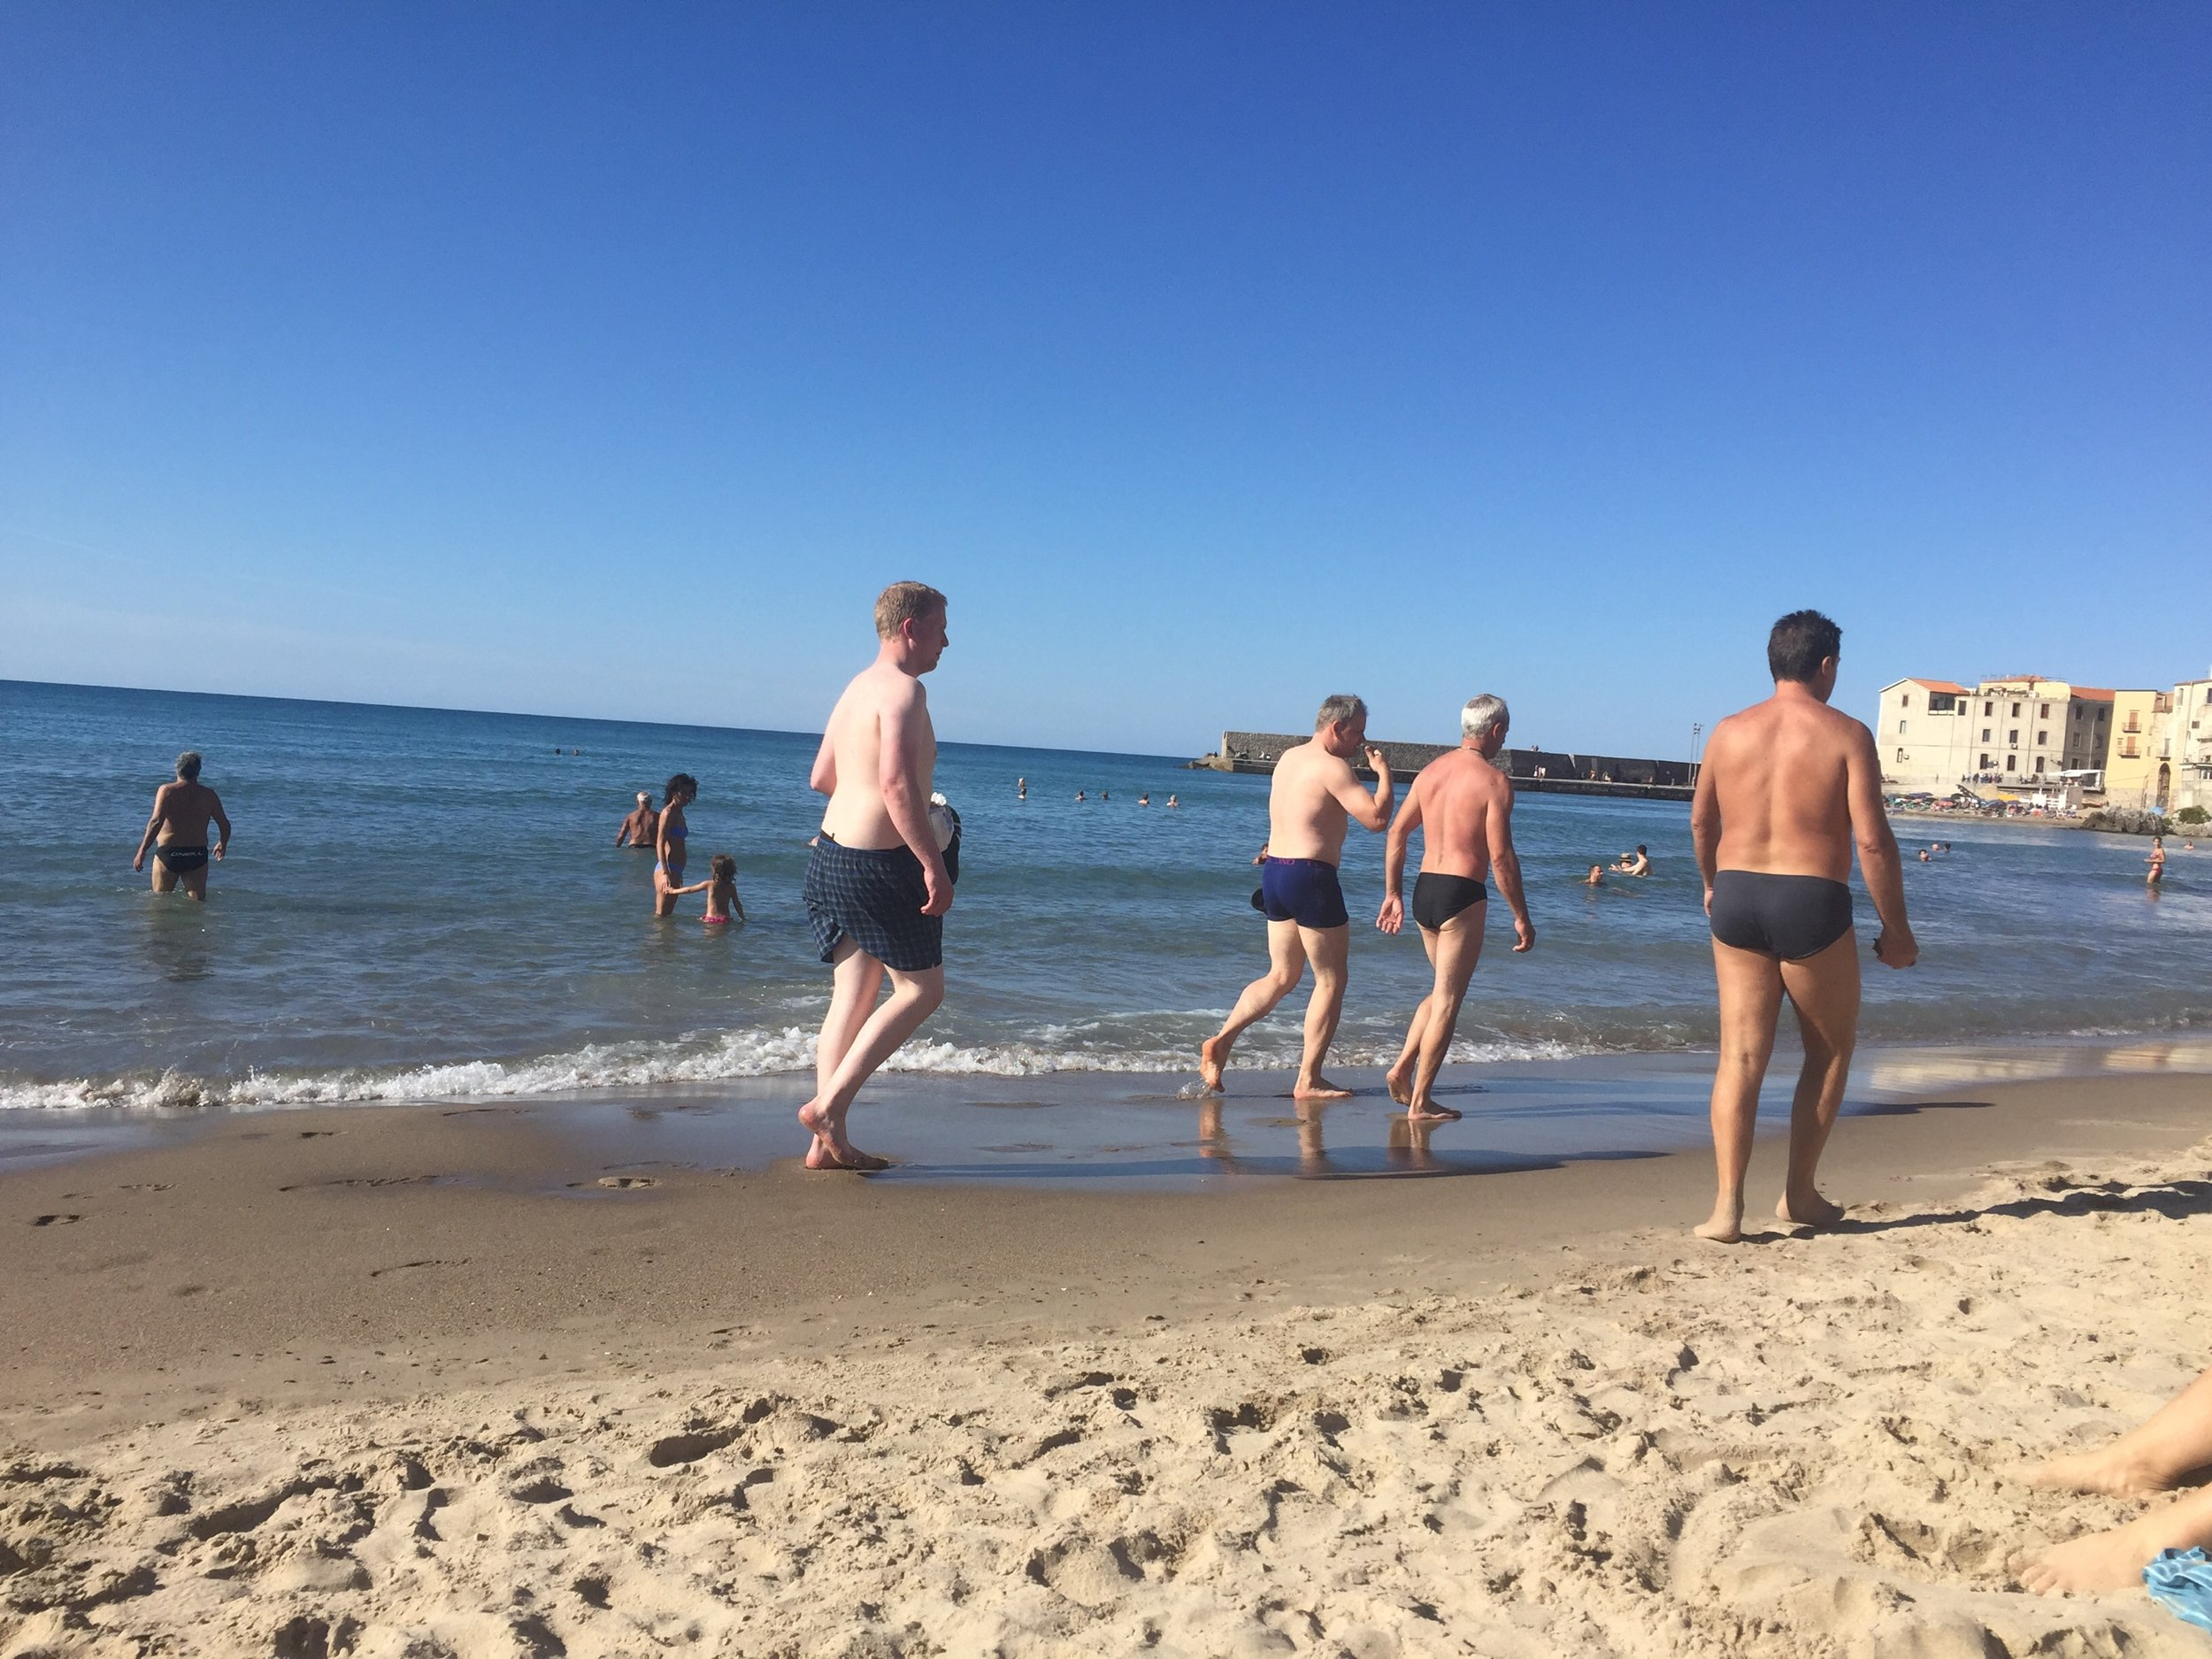 Busty nude beach 33 Celebrities